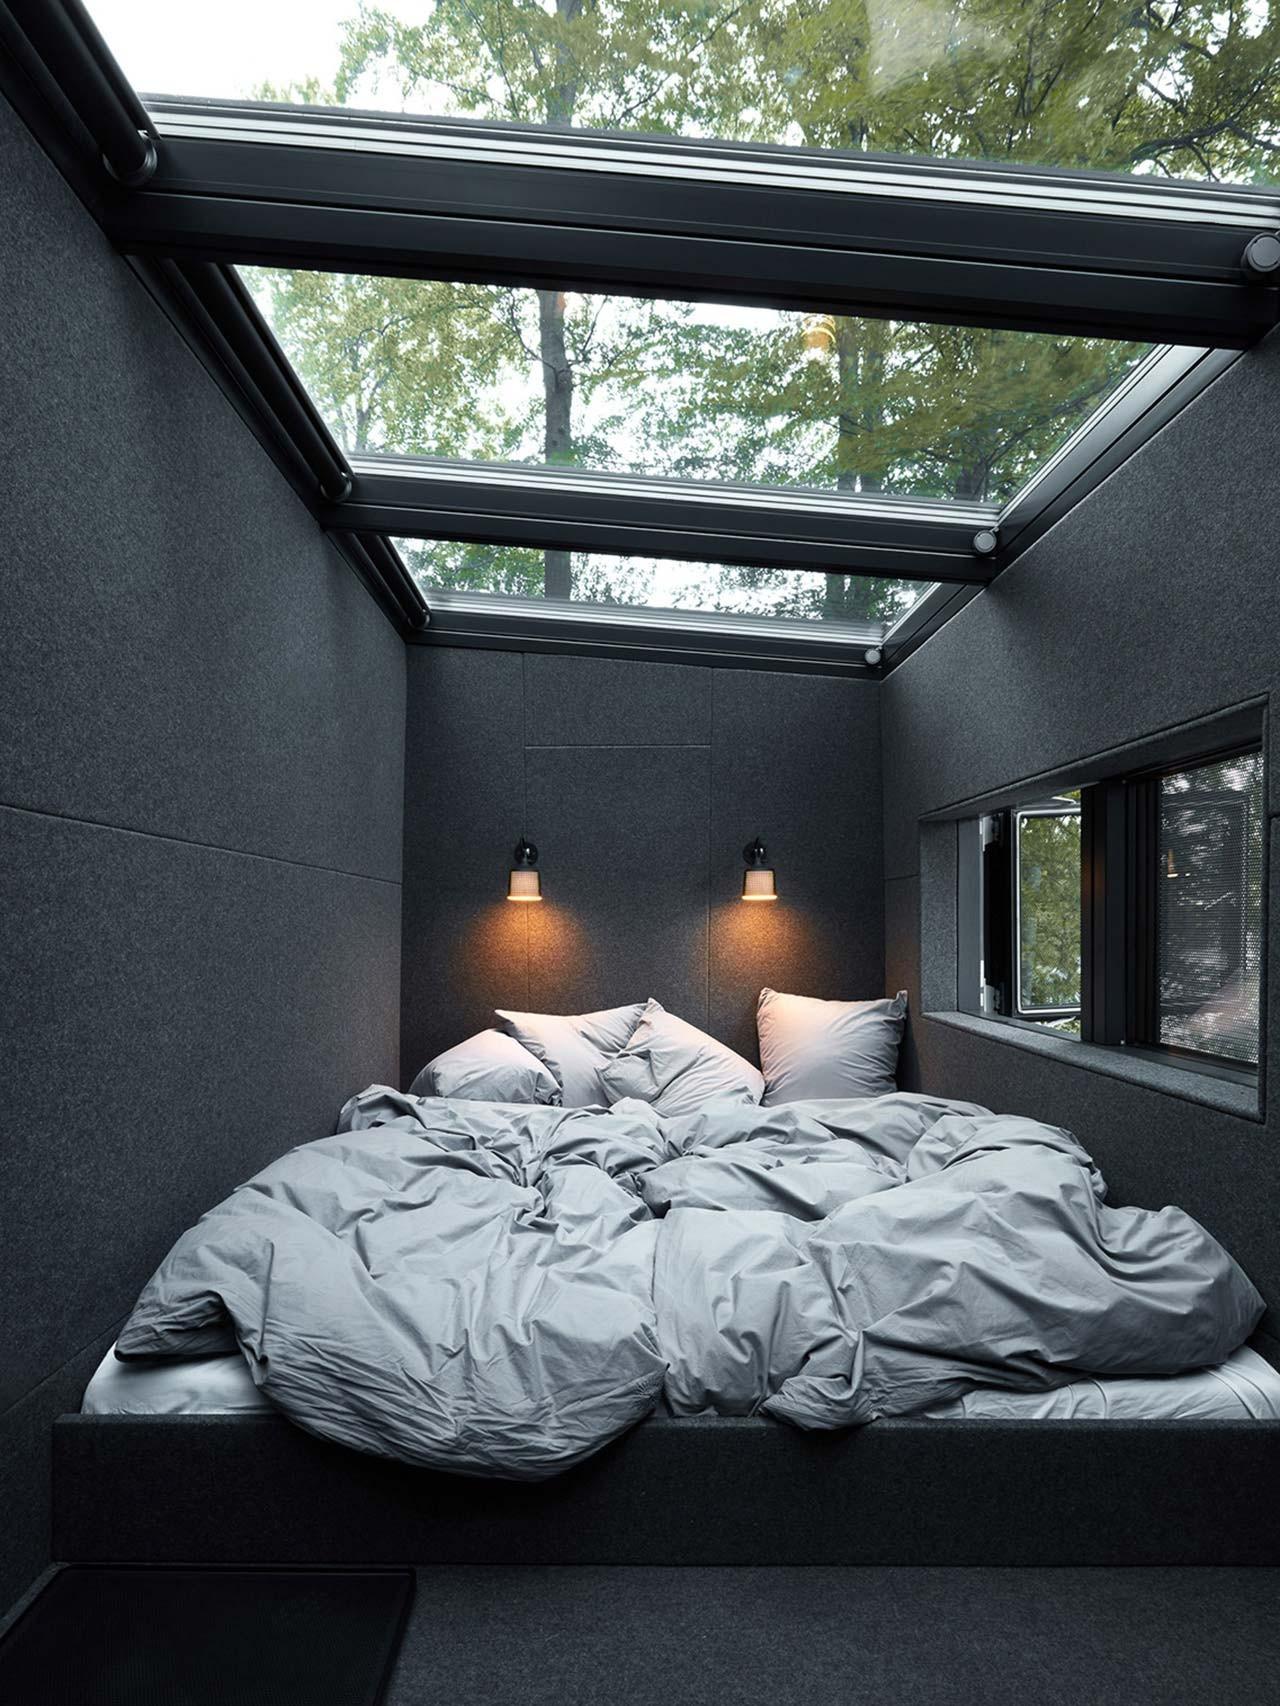 xvipp-shelter-sleeping-area-0-0jpgpagespeedic8depjusmsa.jpg